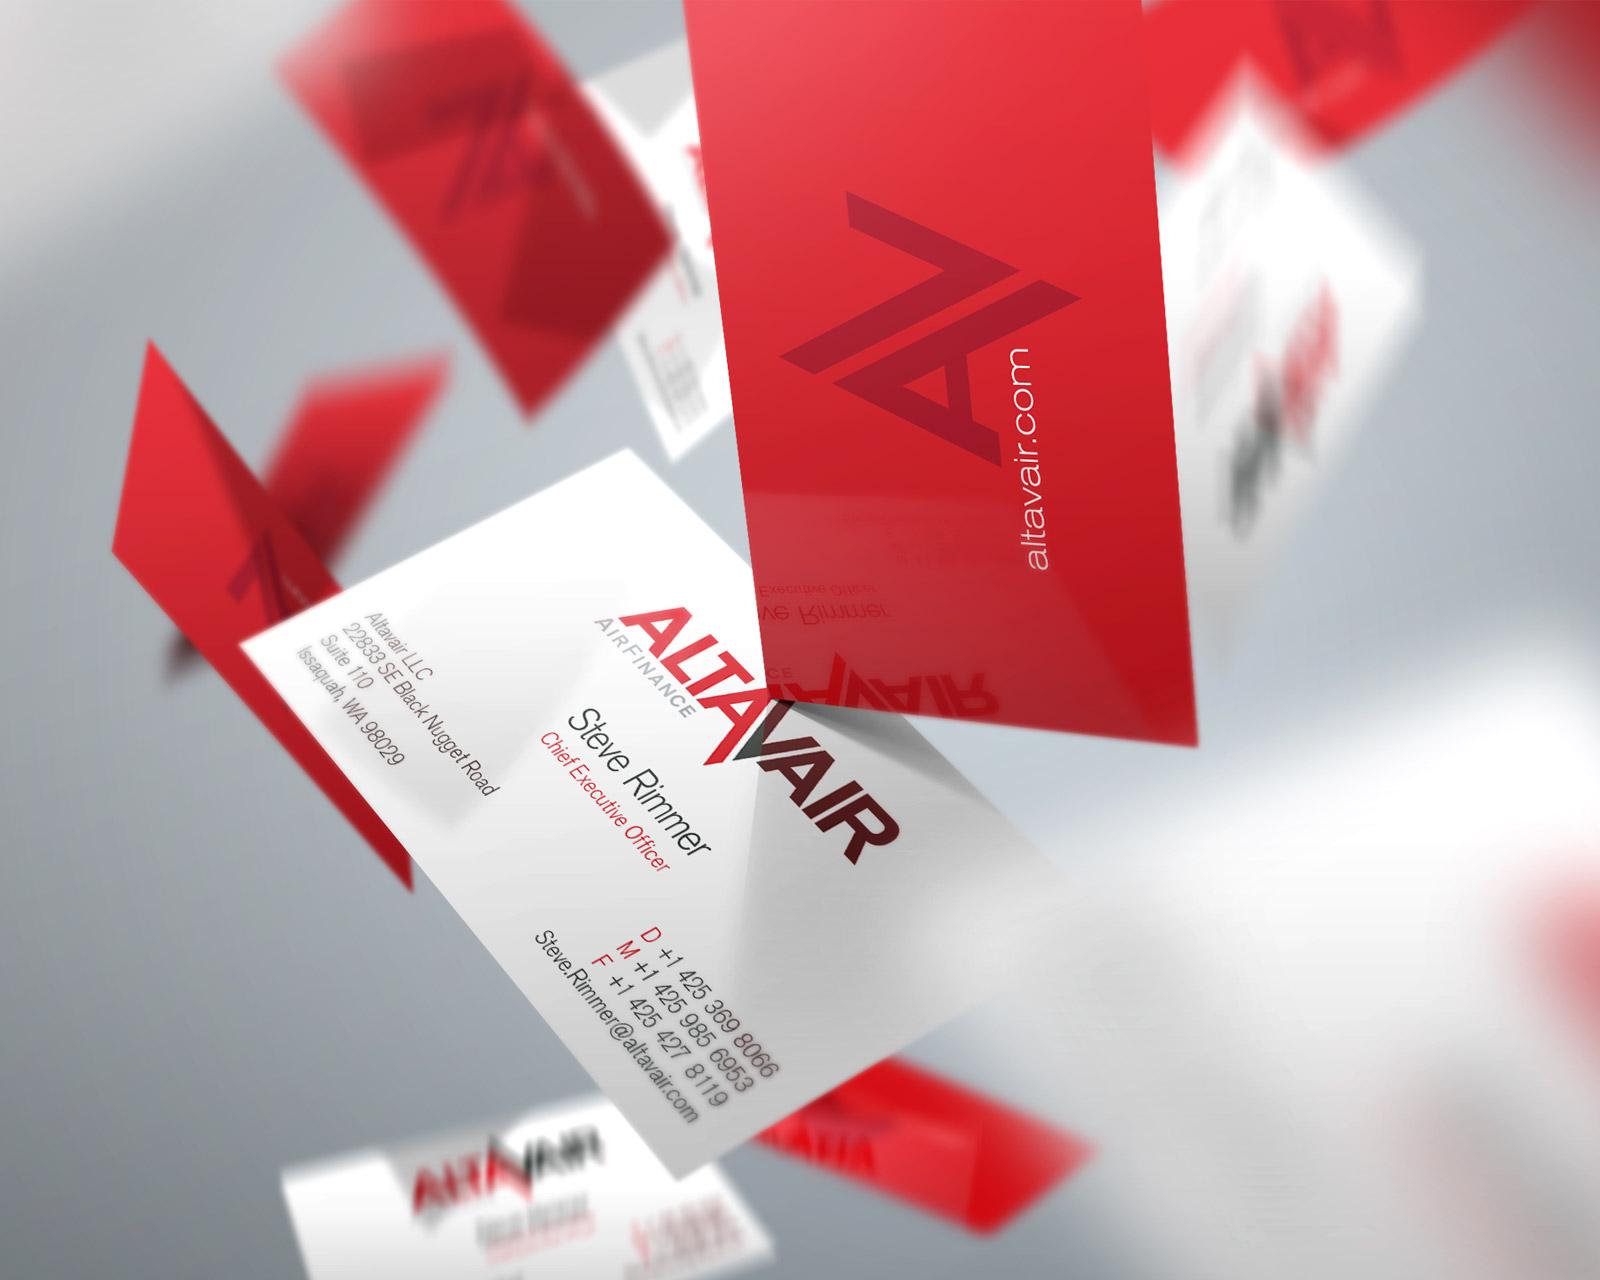 Altavair Branding